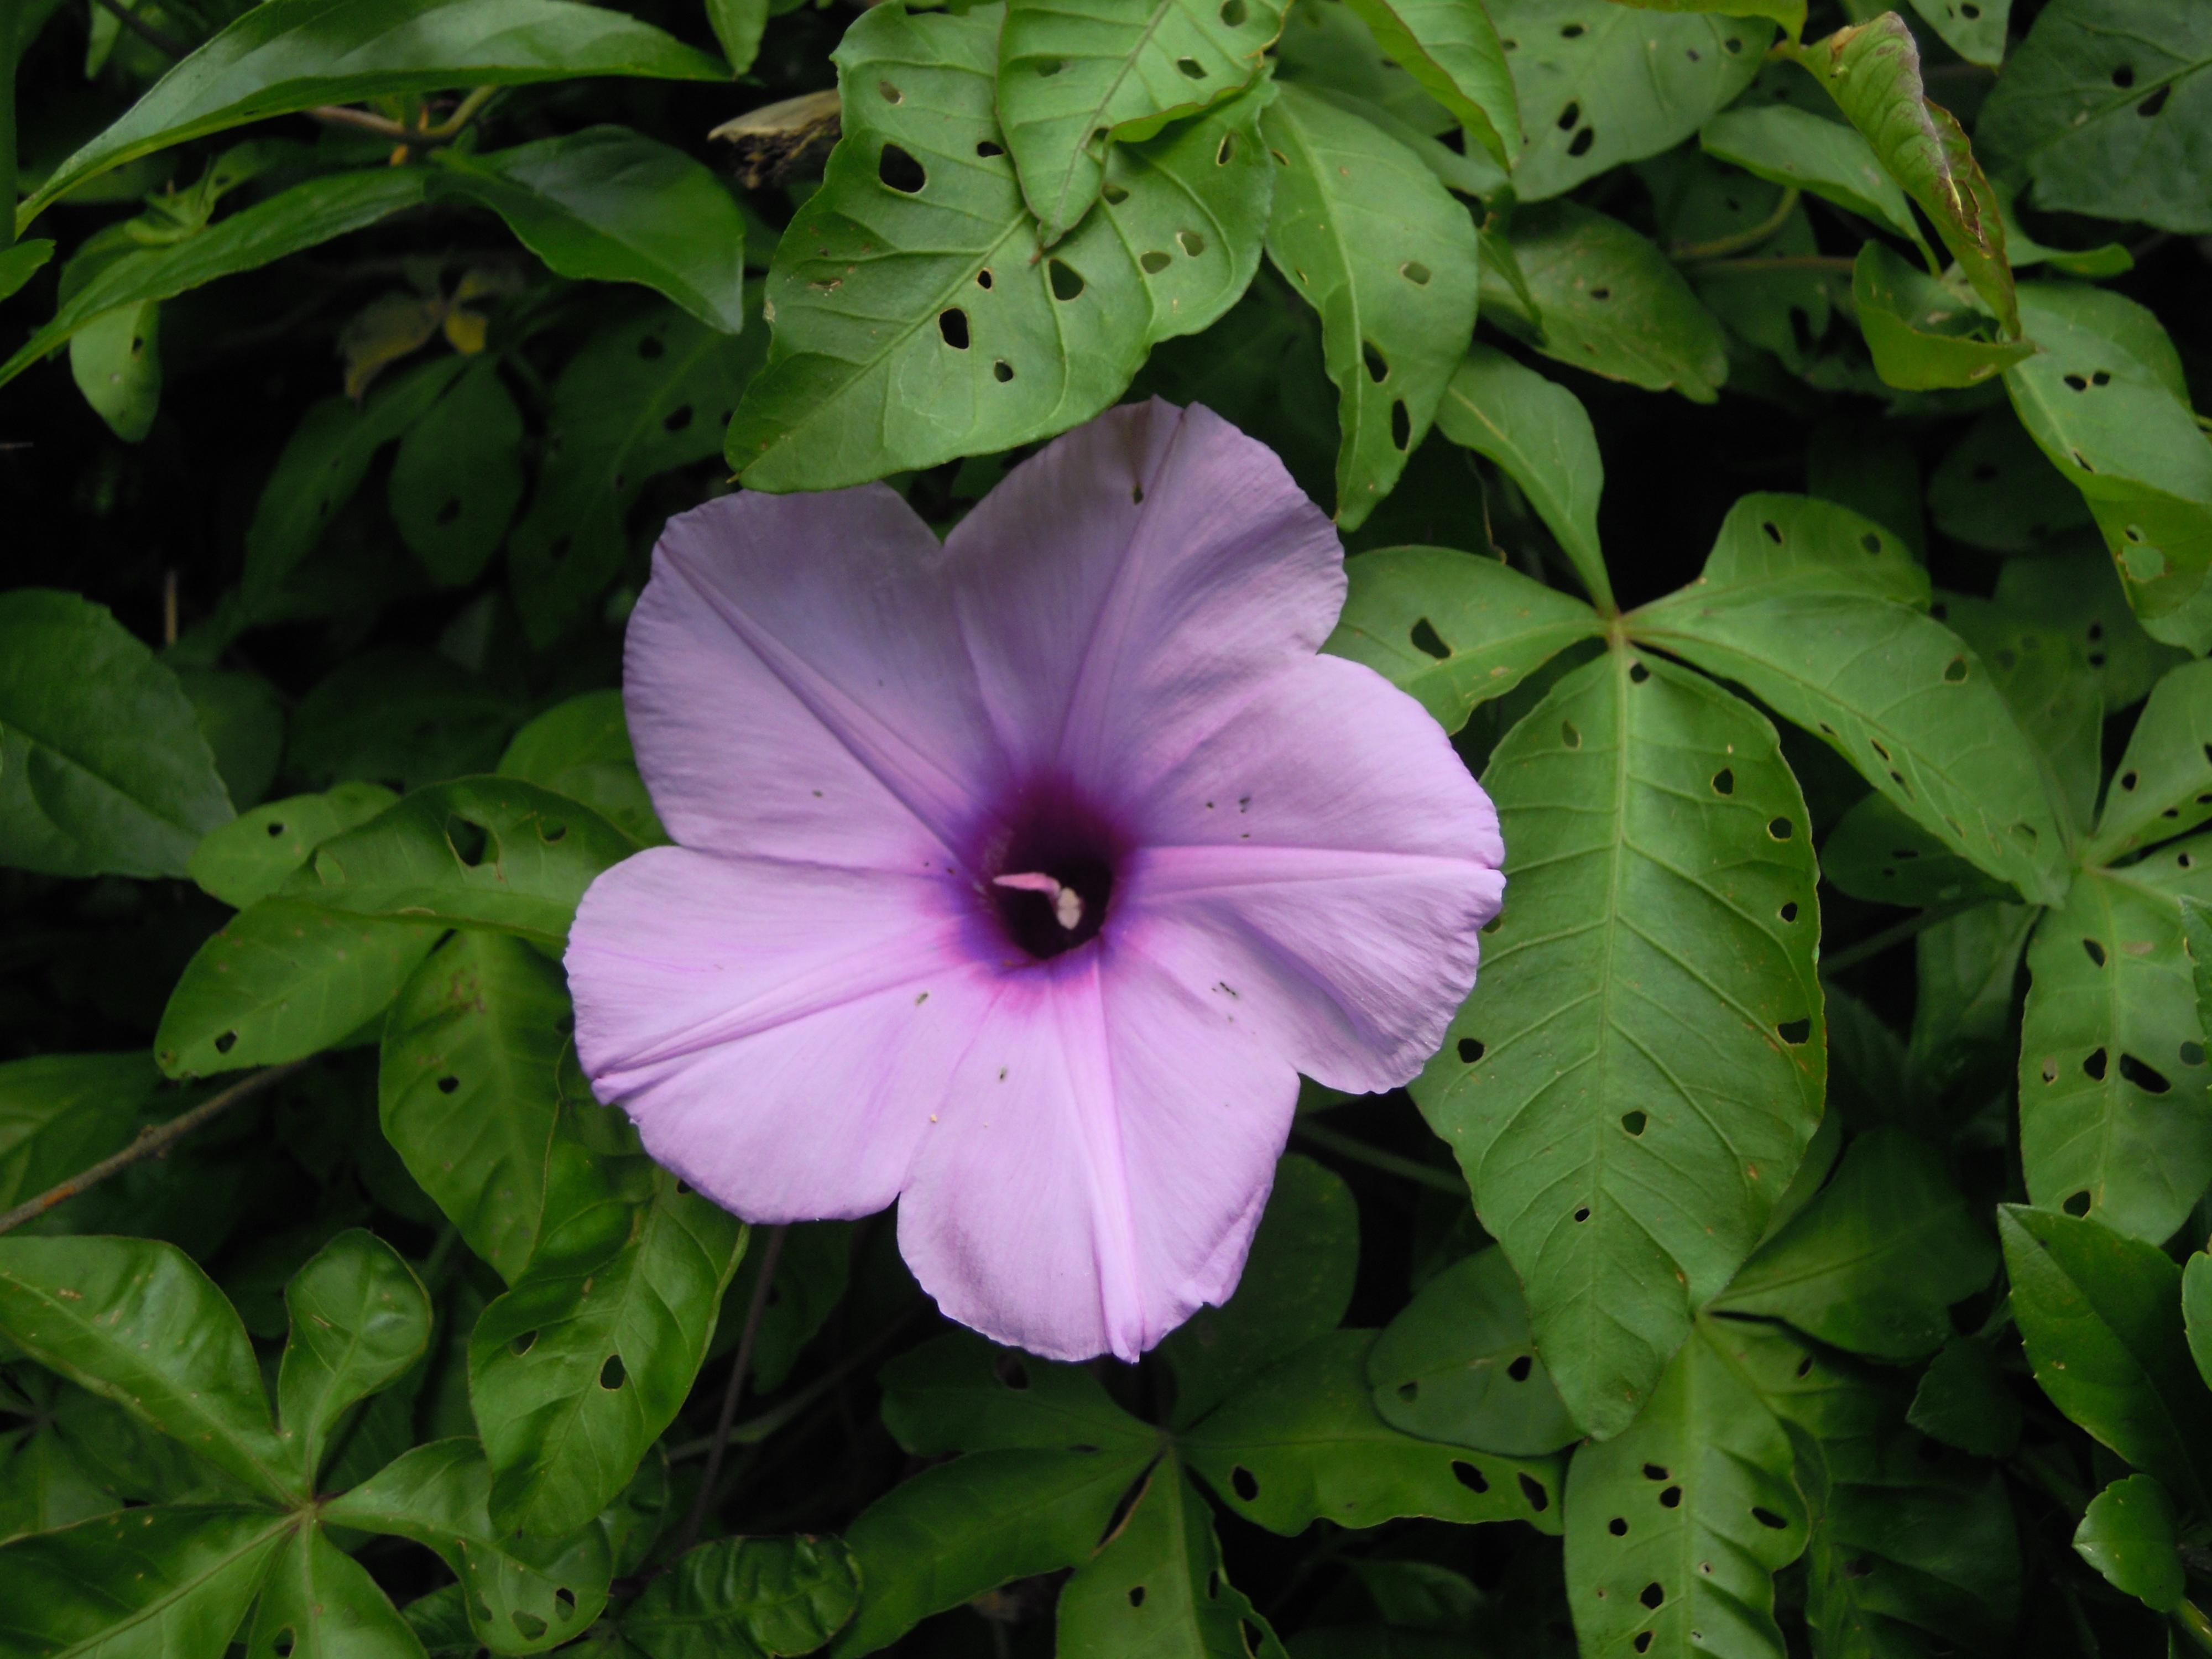 Plant Leaf Flower Purple Petal Green Botany Garden Flora Wildflower Taipei Morning Glory Ipomoea Moonflower Macro